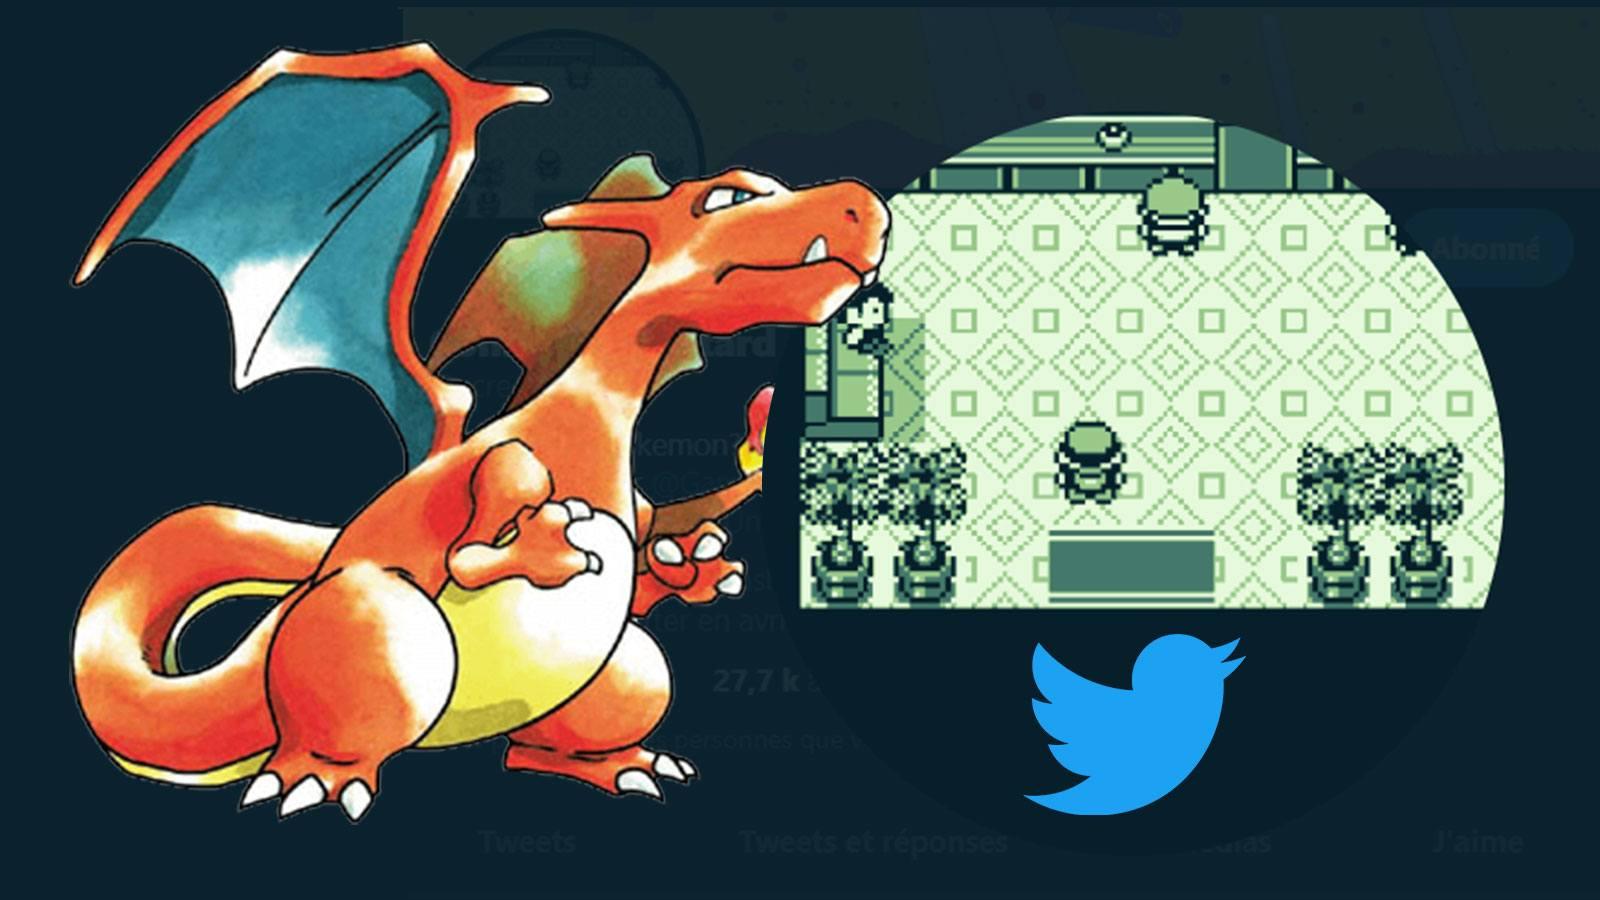 Twitter Plays Pokémon